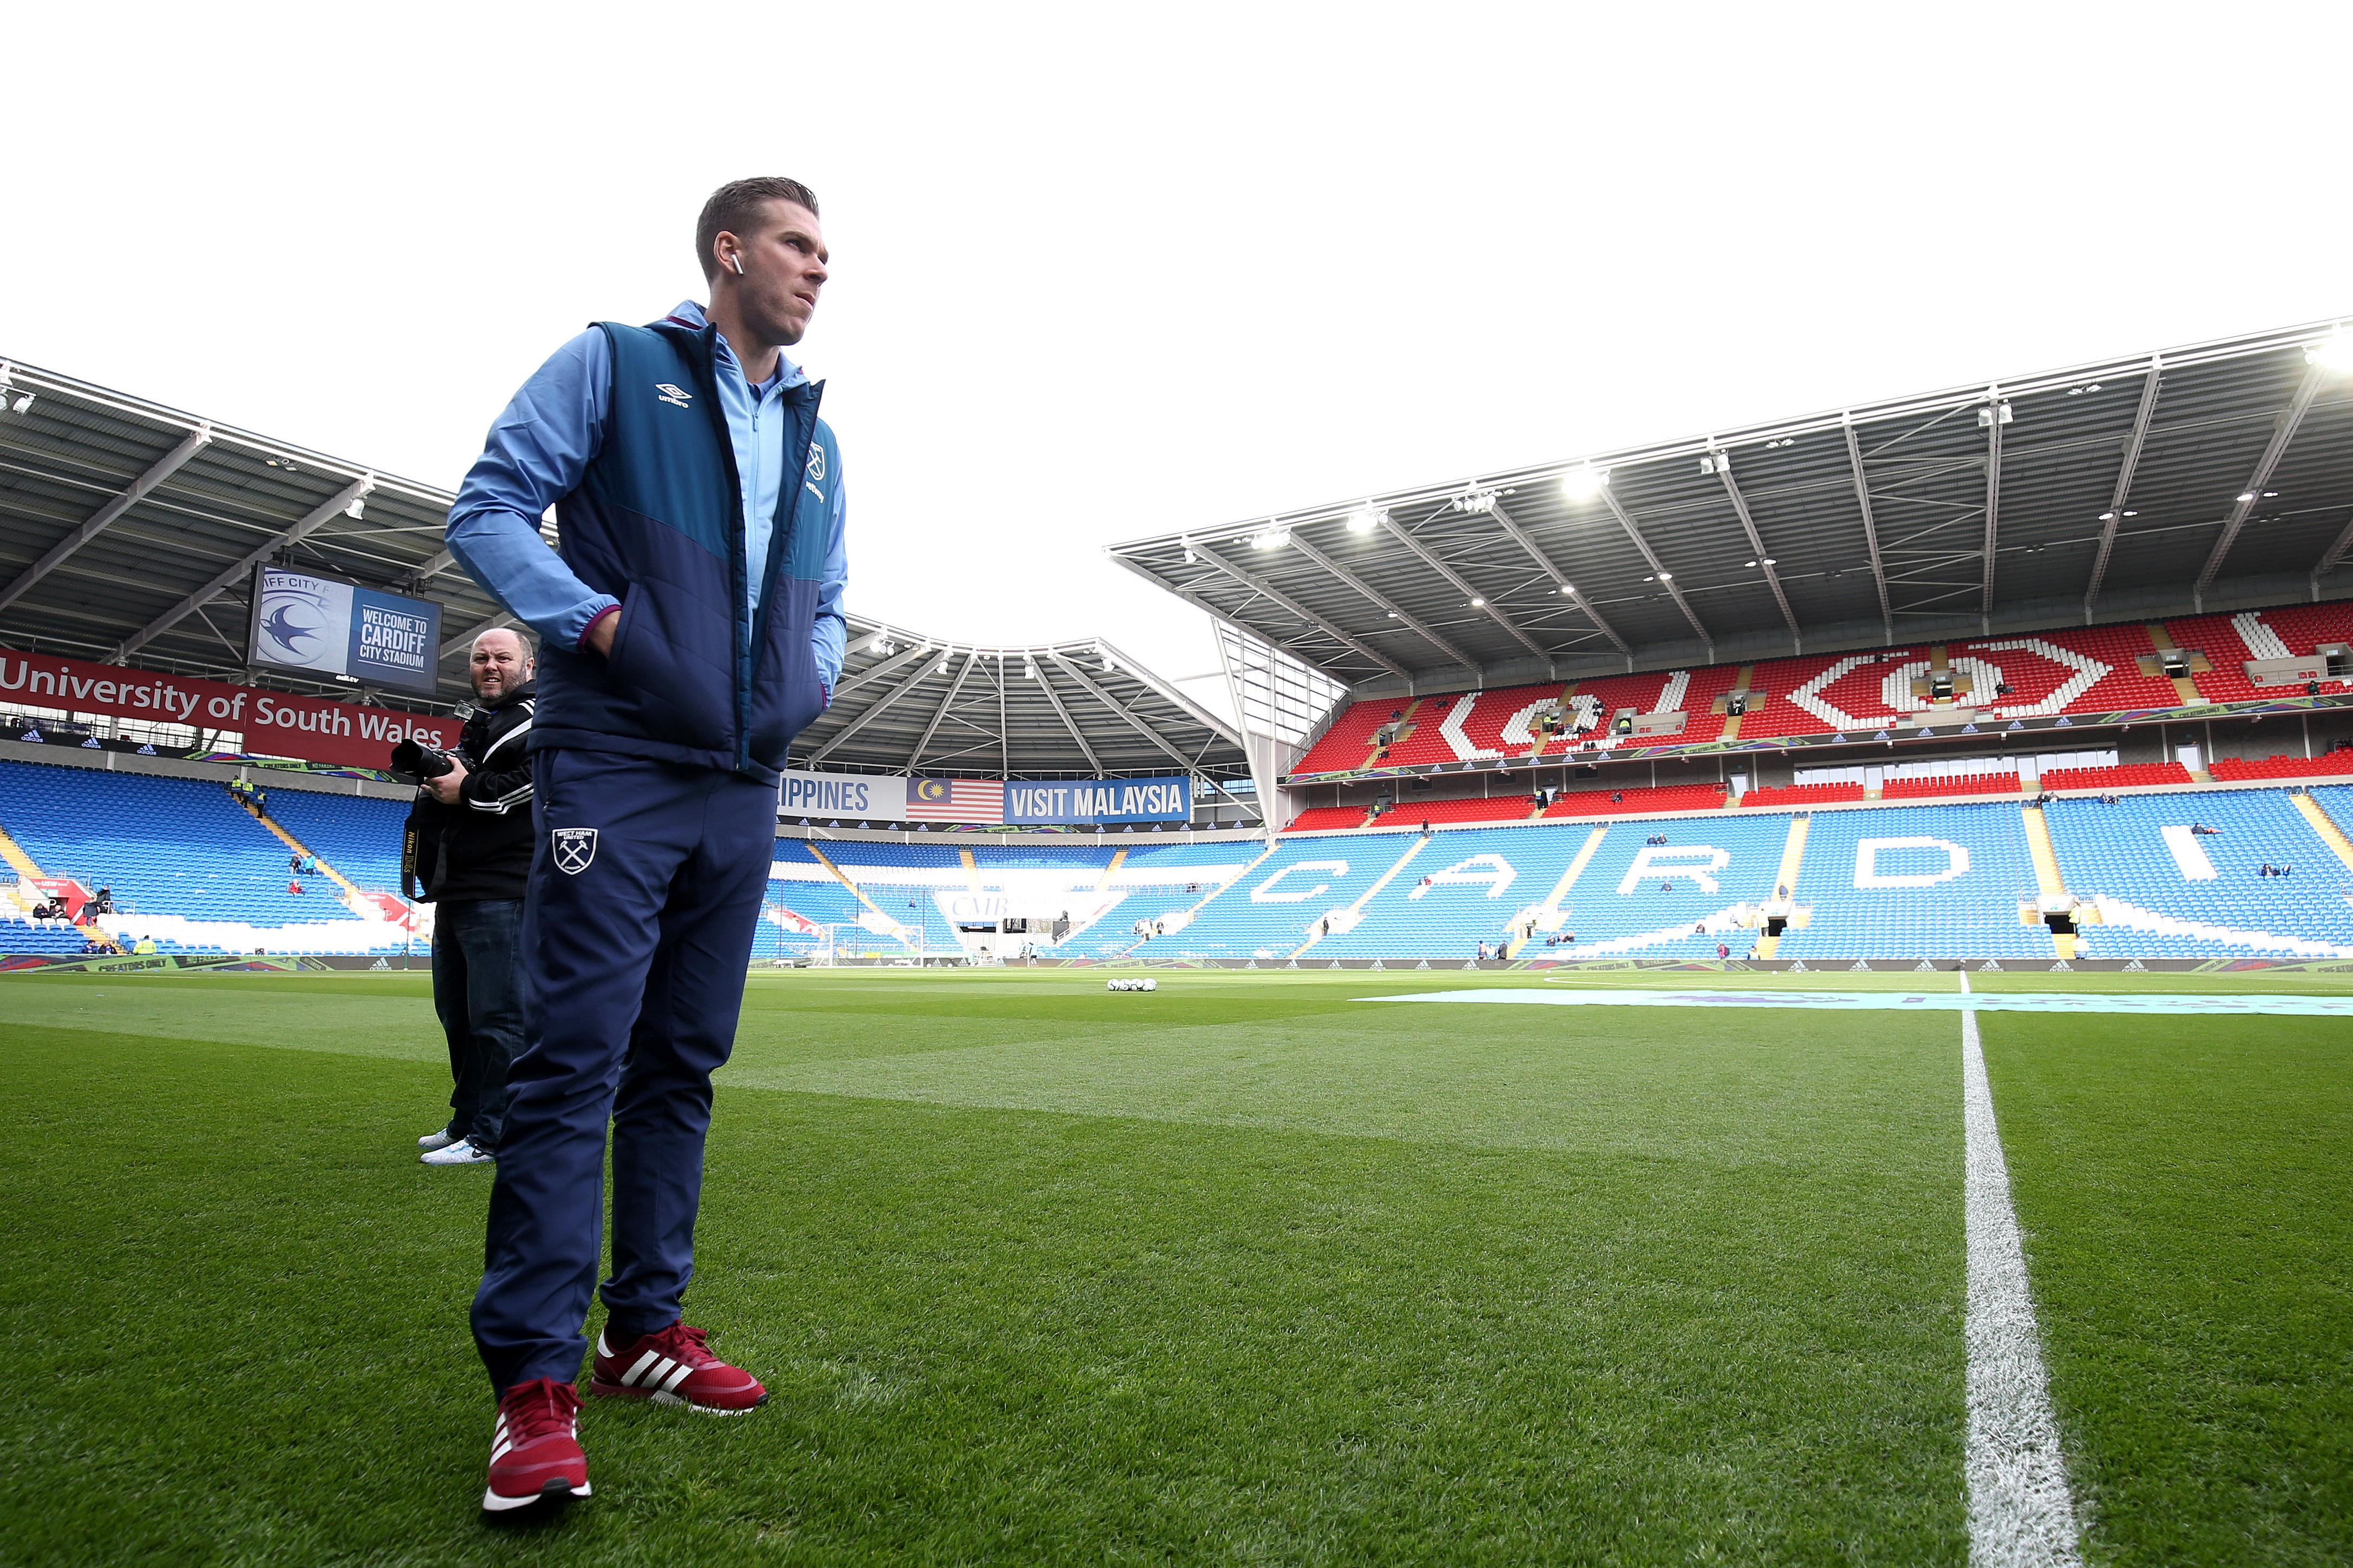 Cardiff City v West Ham United - Premier League